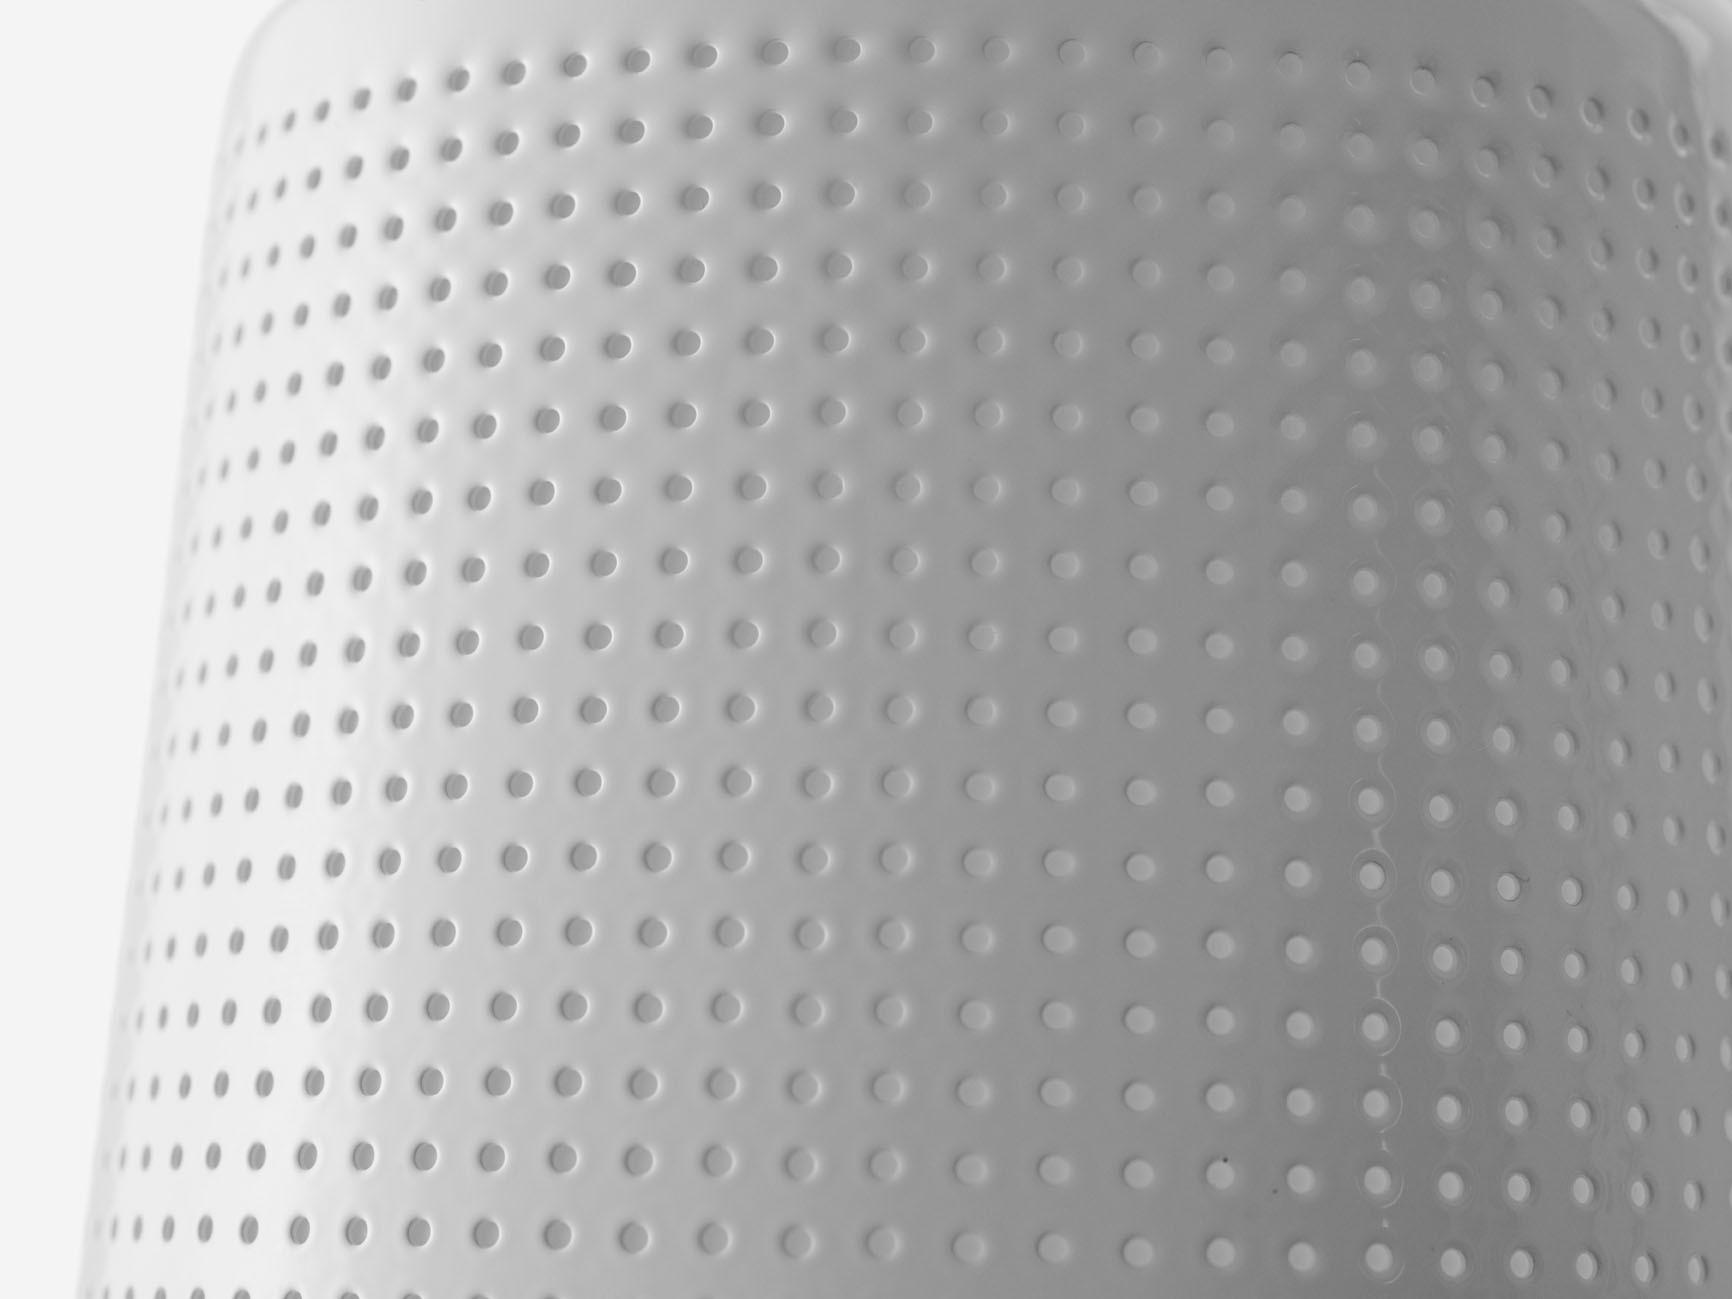 vipp Wall Spot White VIPP524, 52403EU, 5705953006141